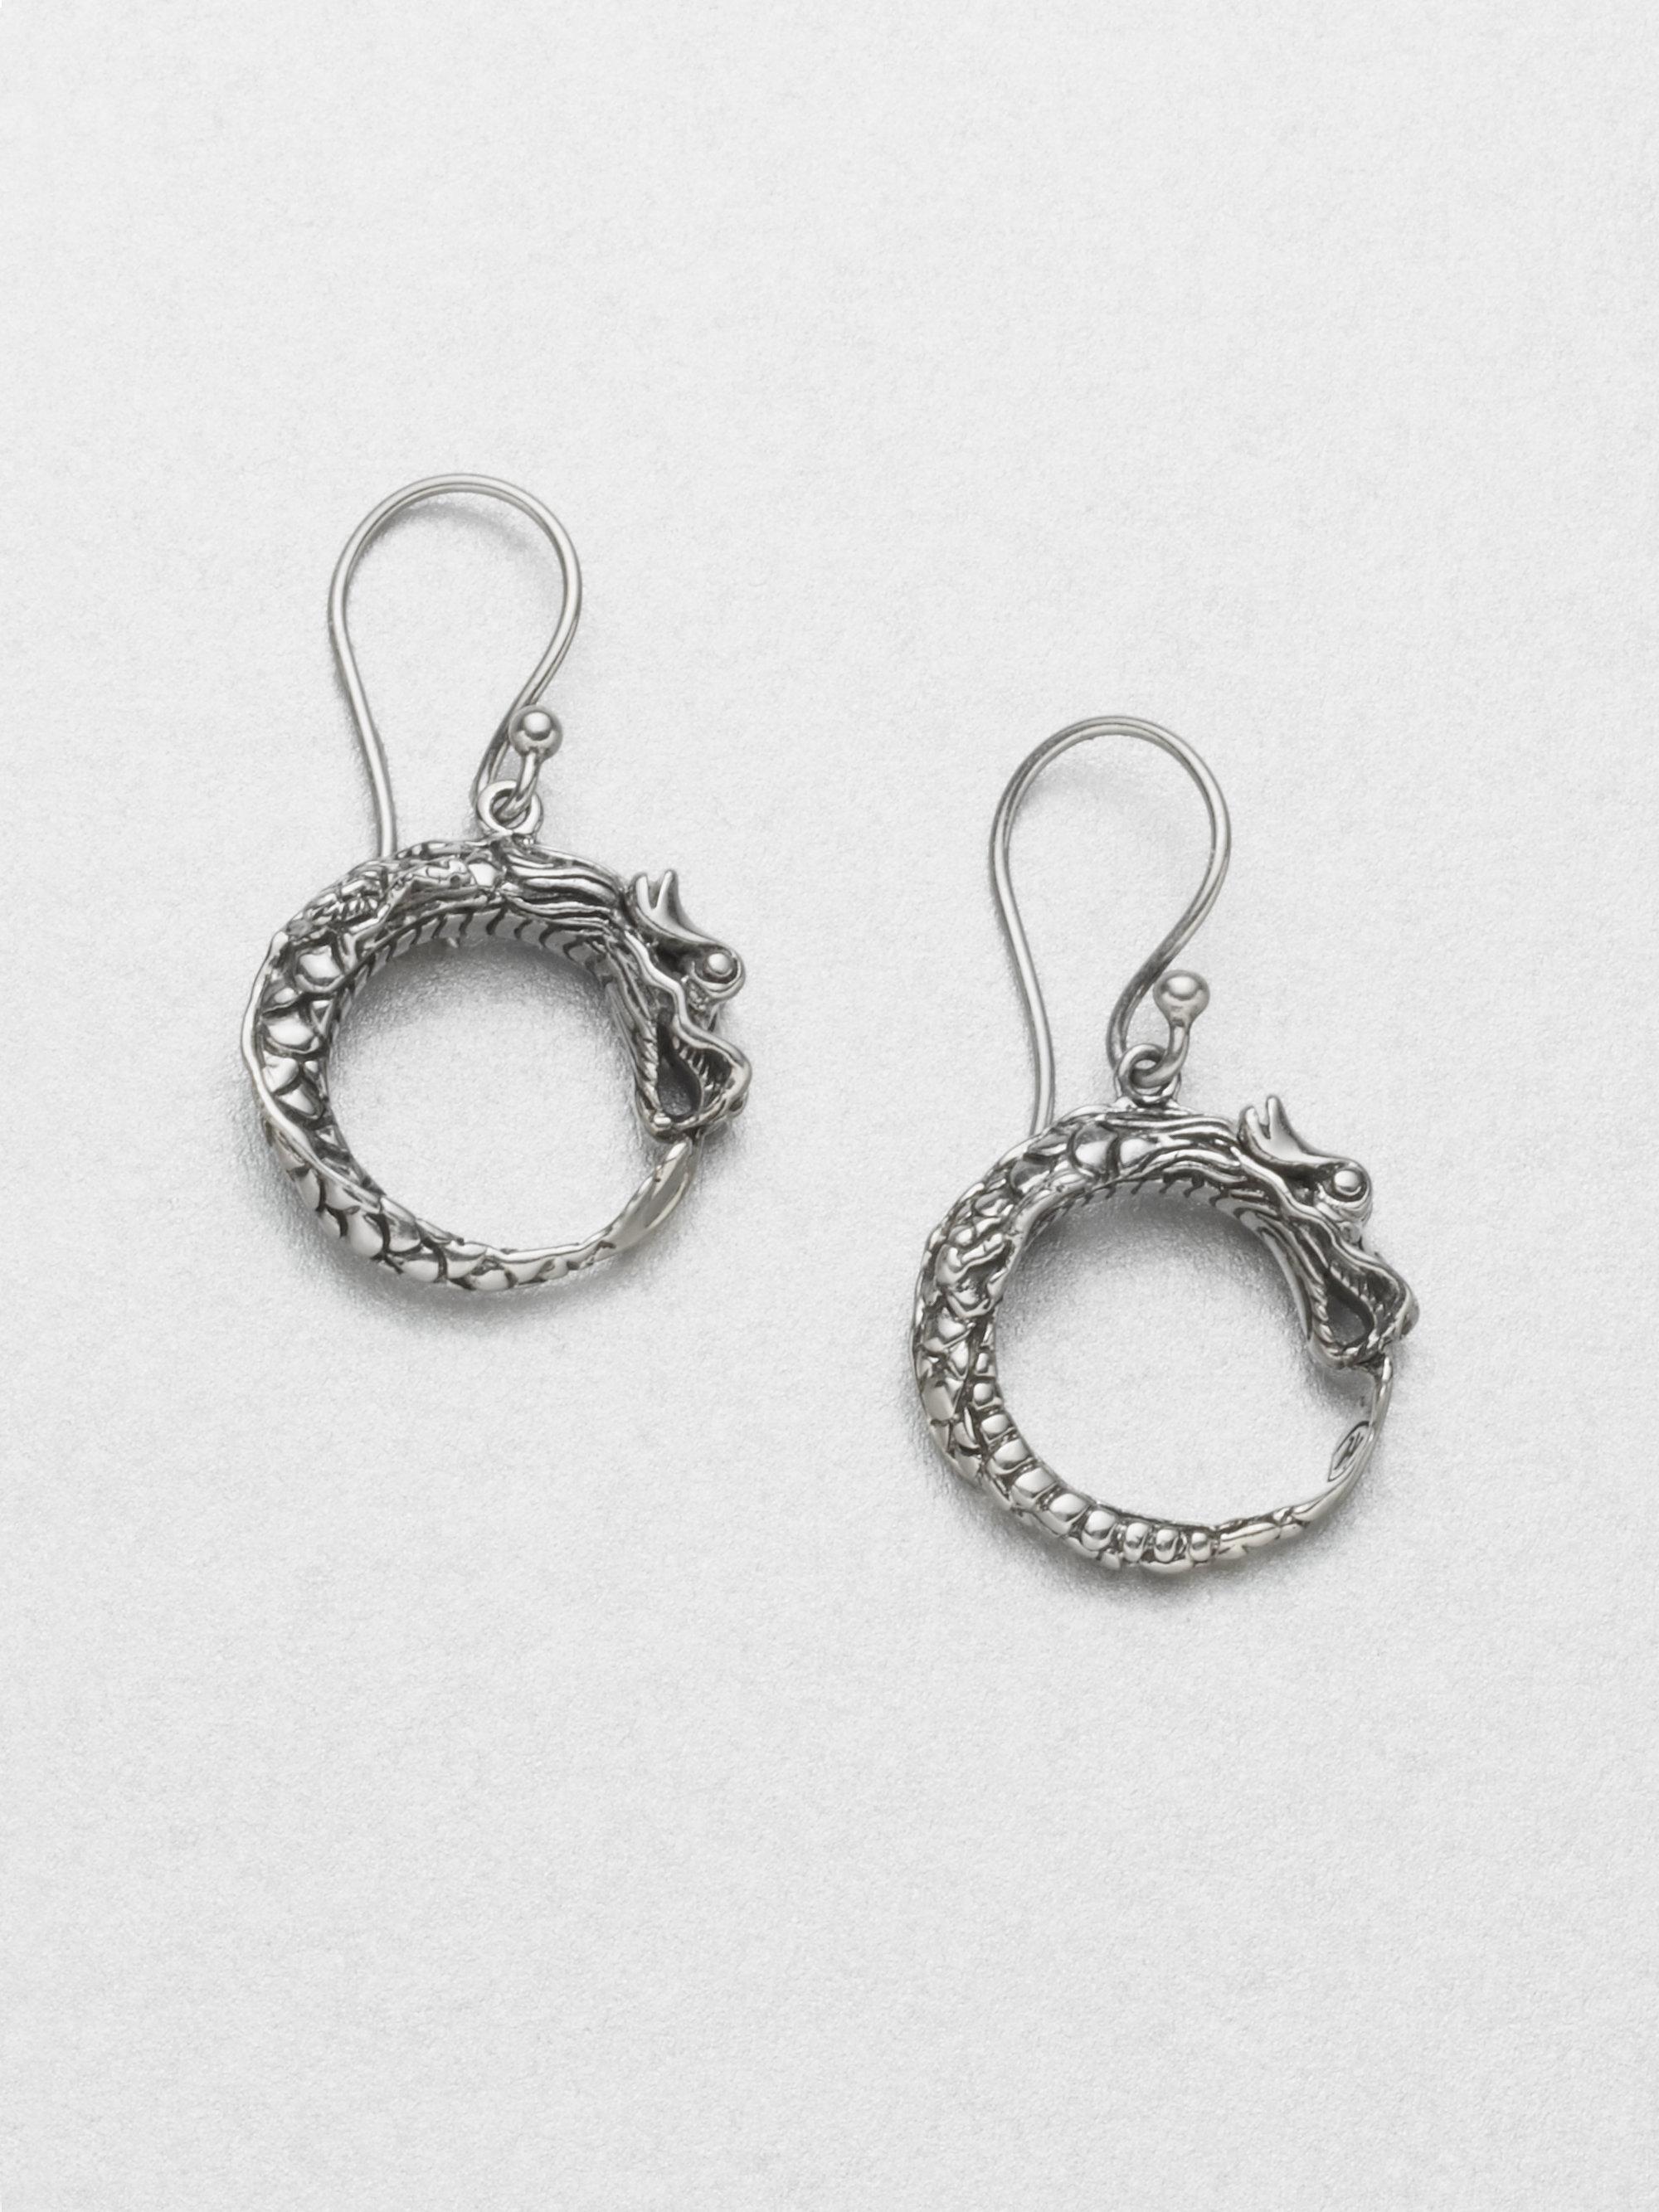 Sterling Silver Dragon Earrings qnmGMNMa9